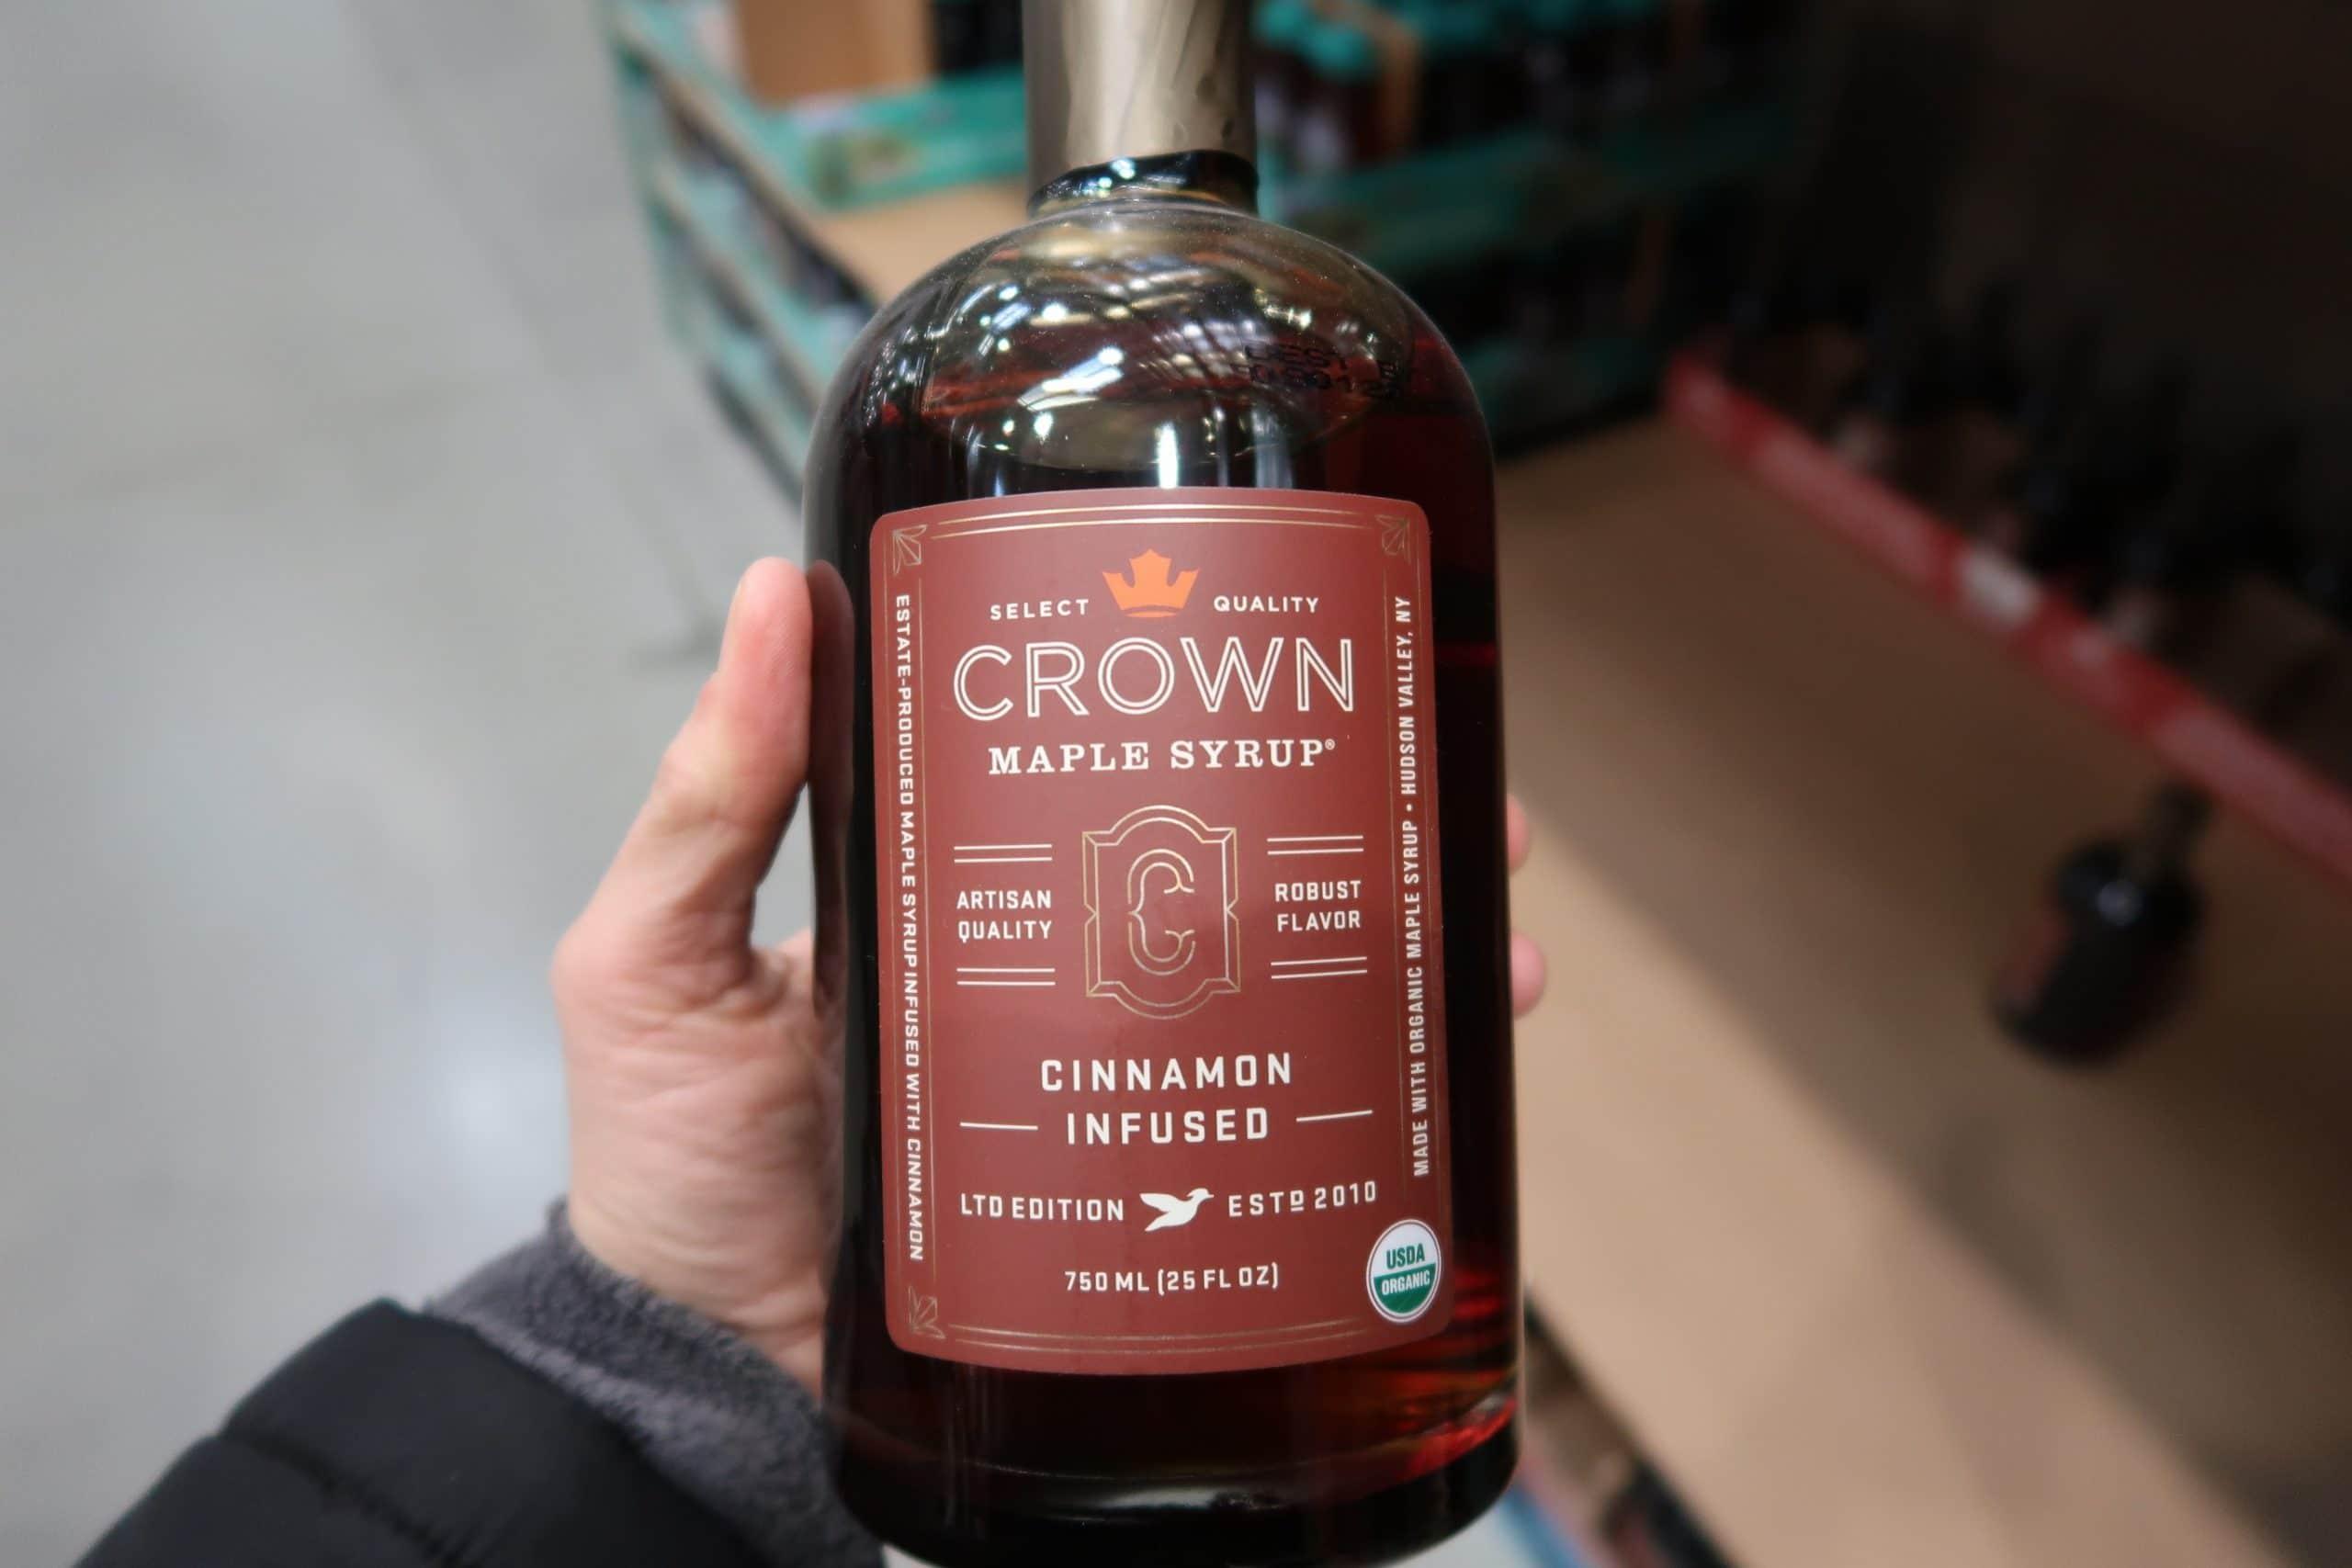 Organic Crown Cinnamon Infused Maple Syrup $9.97